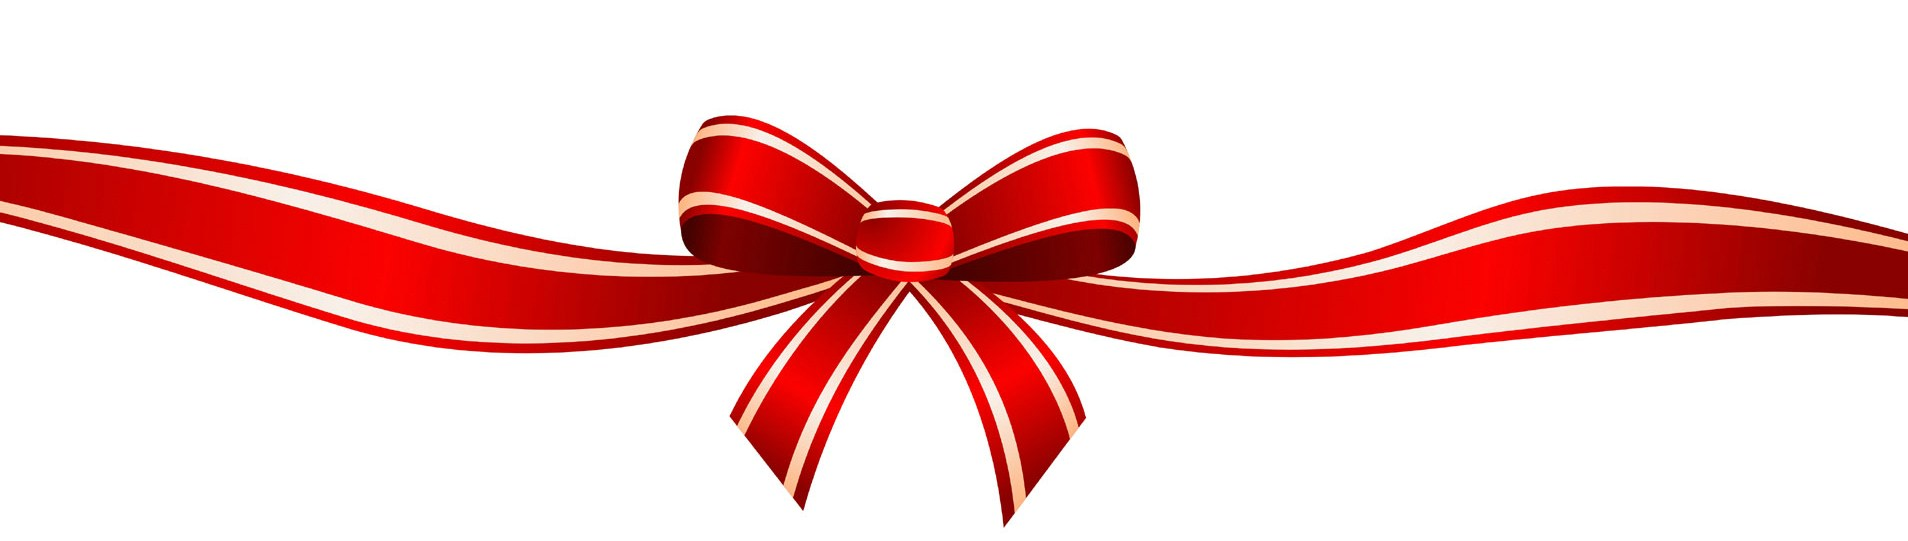 Bow clipart xmas. Attractive ideas christmas free